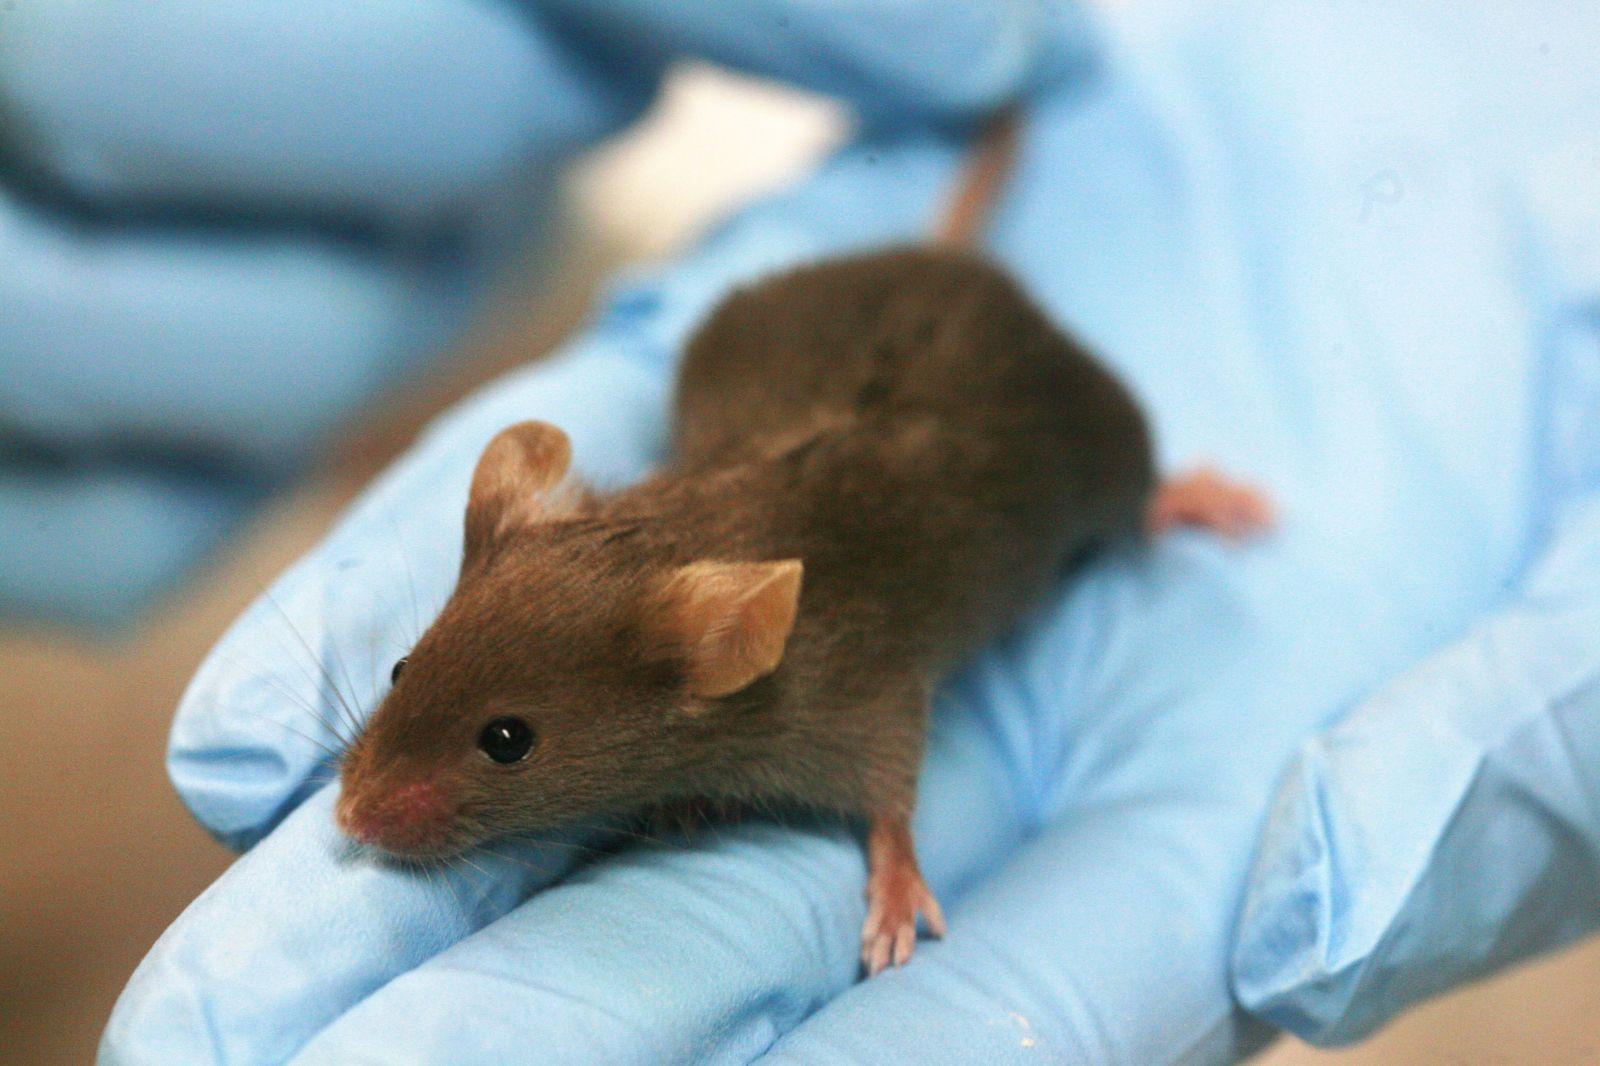 Průlom v boji s HIV: Vědci poprvé v historii vyléčili nakažené myši